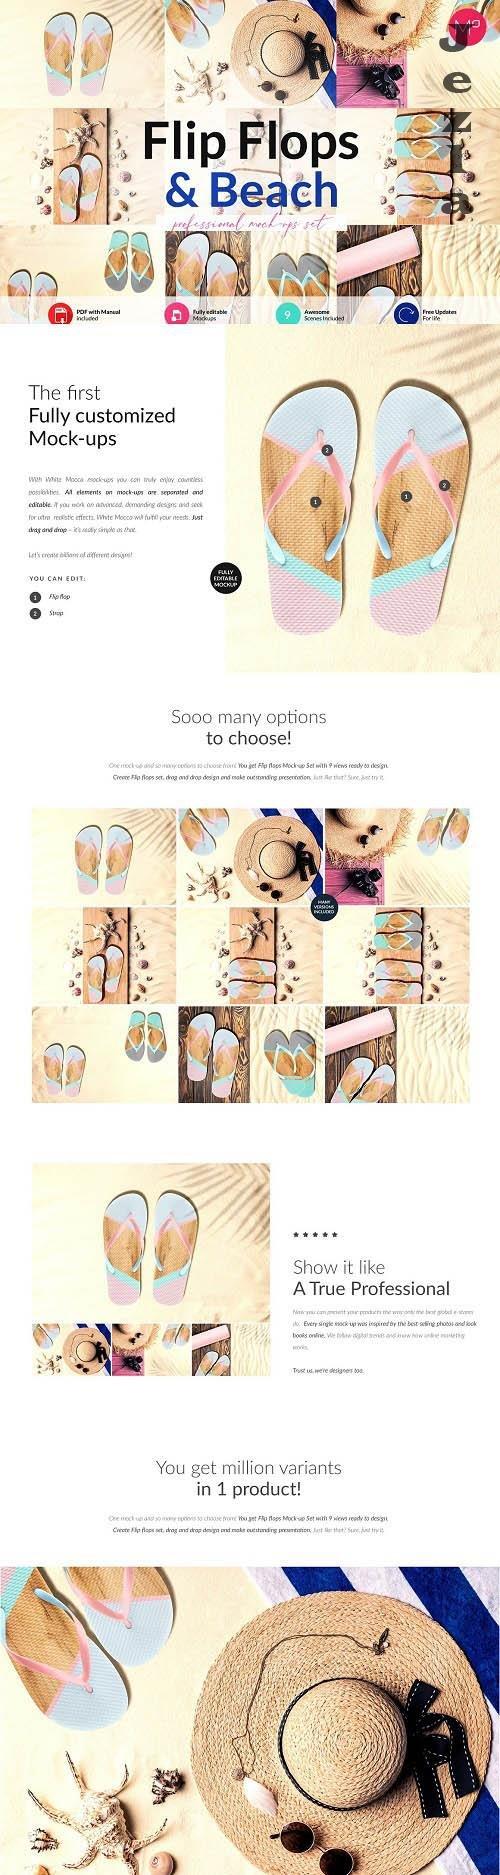 Flip Flops & Beach Mock-ups Set - 6195994